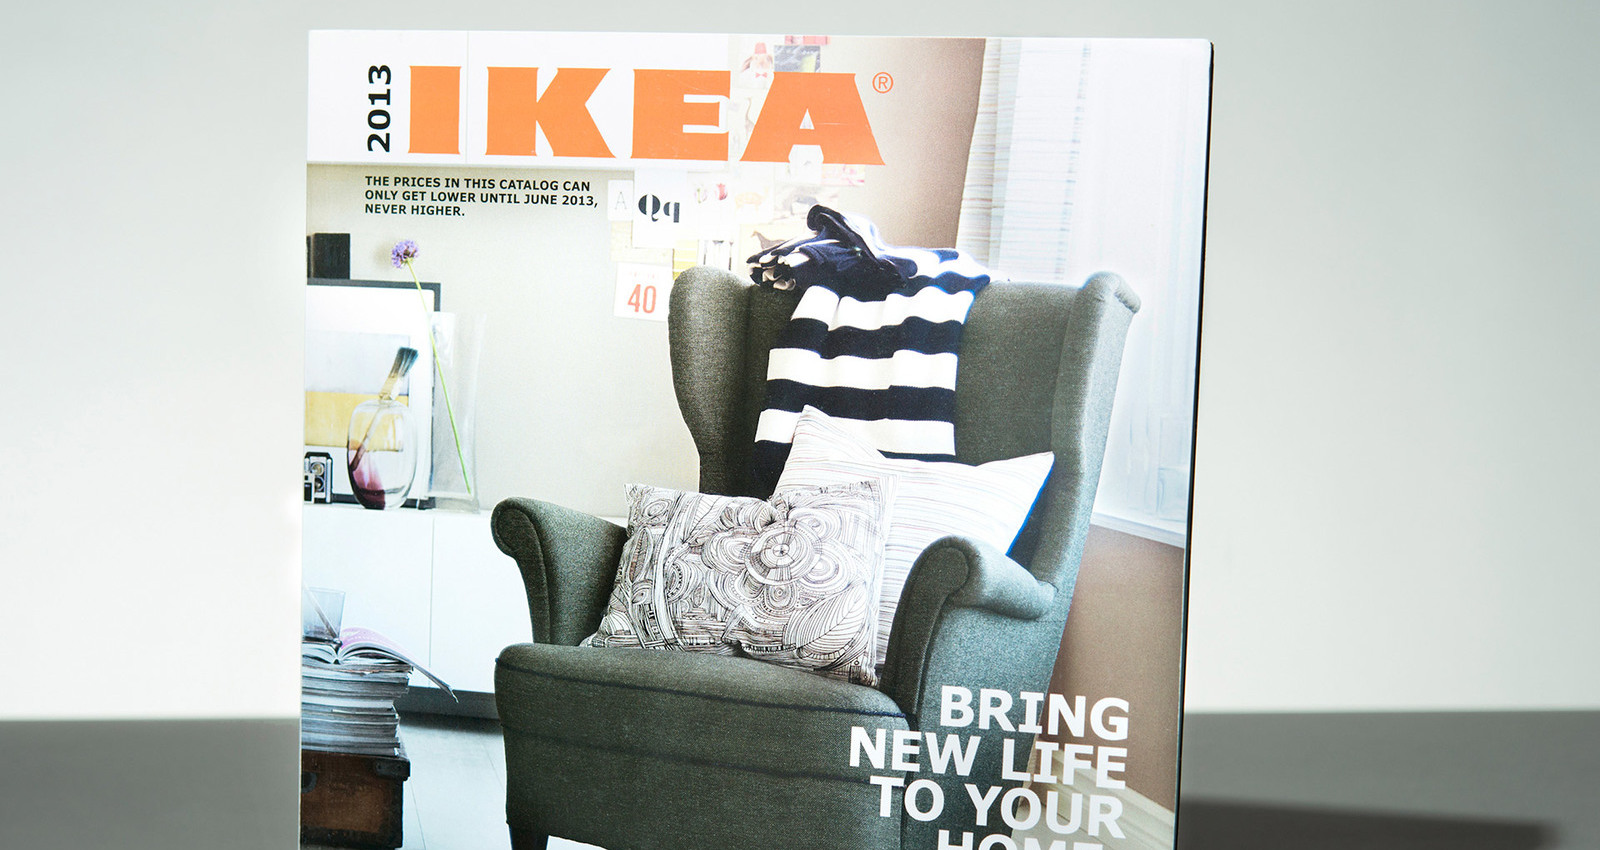 The 2013 IKEA Catalog Application